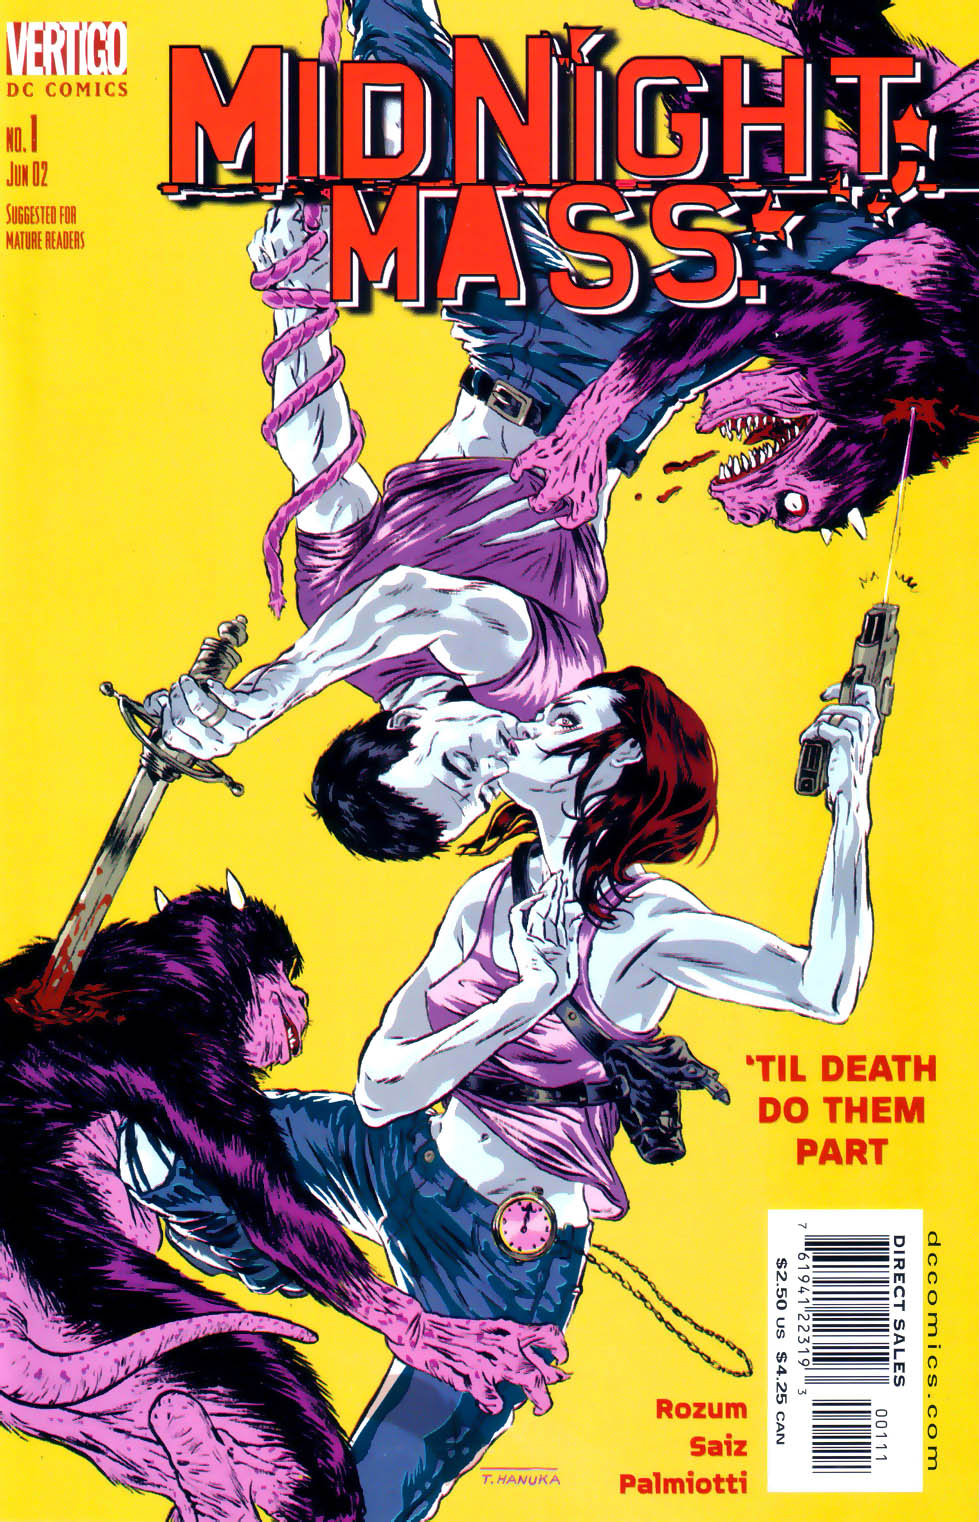 Read online Midnight, Mass comic -  Issue #1 - 1